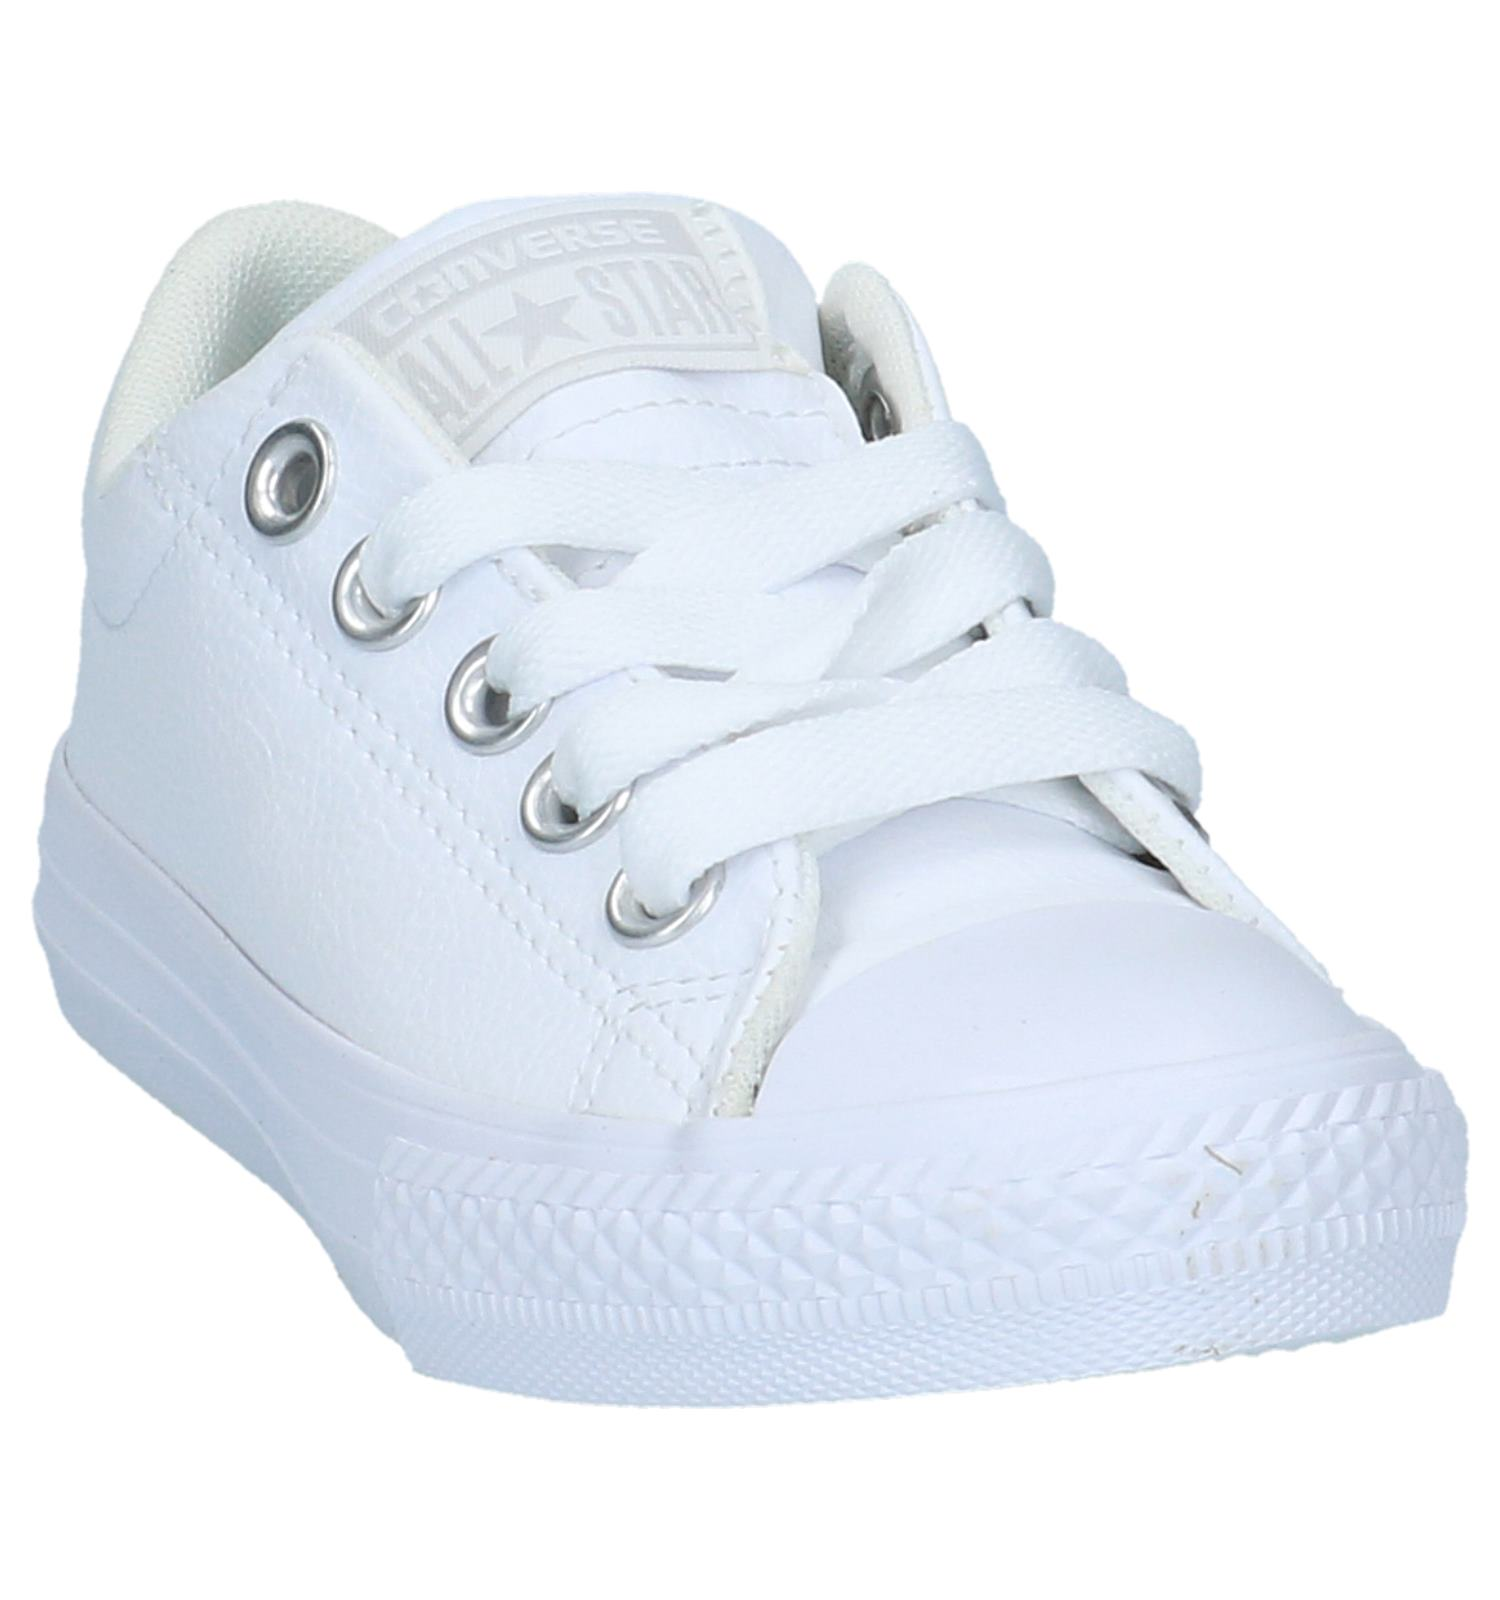 8a4fe017cf3 Witte Lage Sportieve Sneakers Converse All Star Chuck Taylor Street    TORFS.BE   Gratis verzend en retour